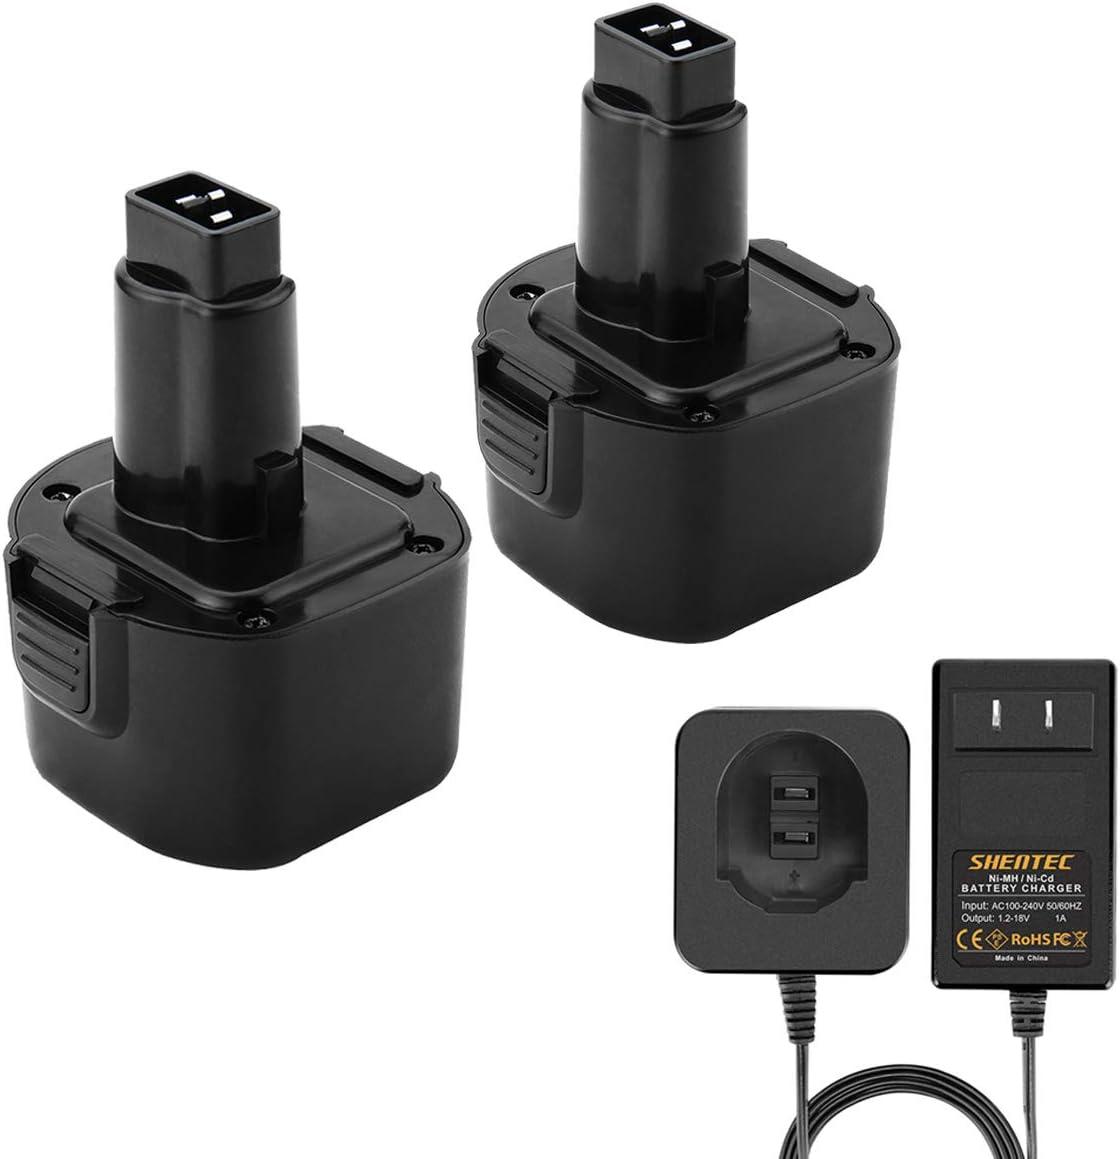 Shentec 2 Pack 9.6V 3.0Ah Battery Compatible with Dewalt 9.6V DW9062 DW9061 DE9036 DE9061 DE9062 DW9614 DW050 and Black & Decker PS120 Fire Storm Replacement Battery Ni-MH(Battery Charger Included)